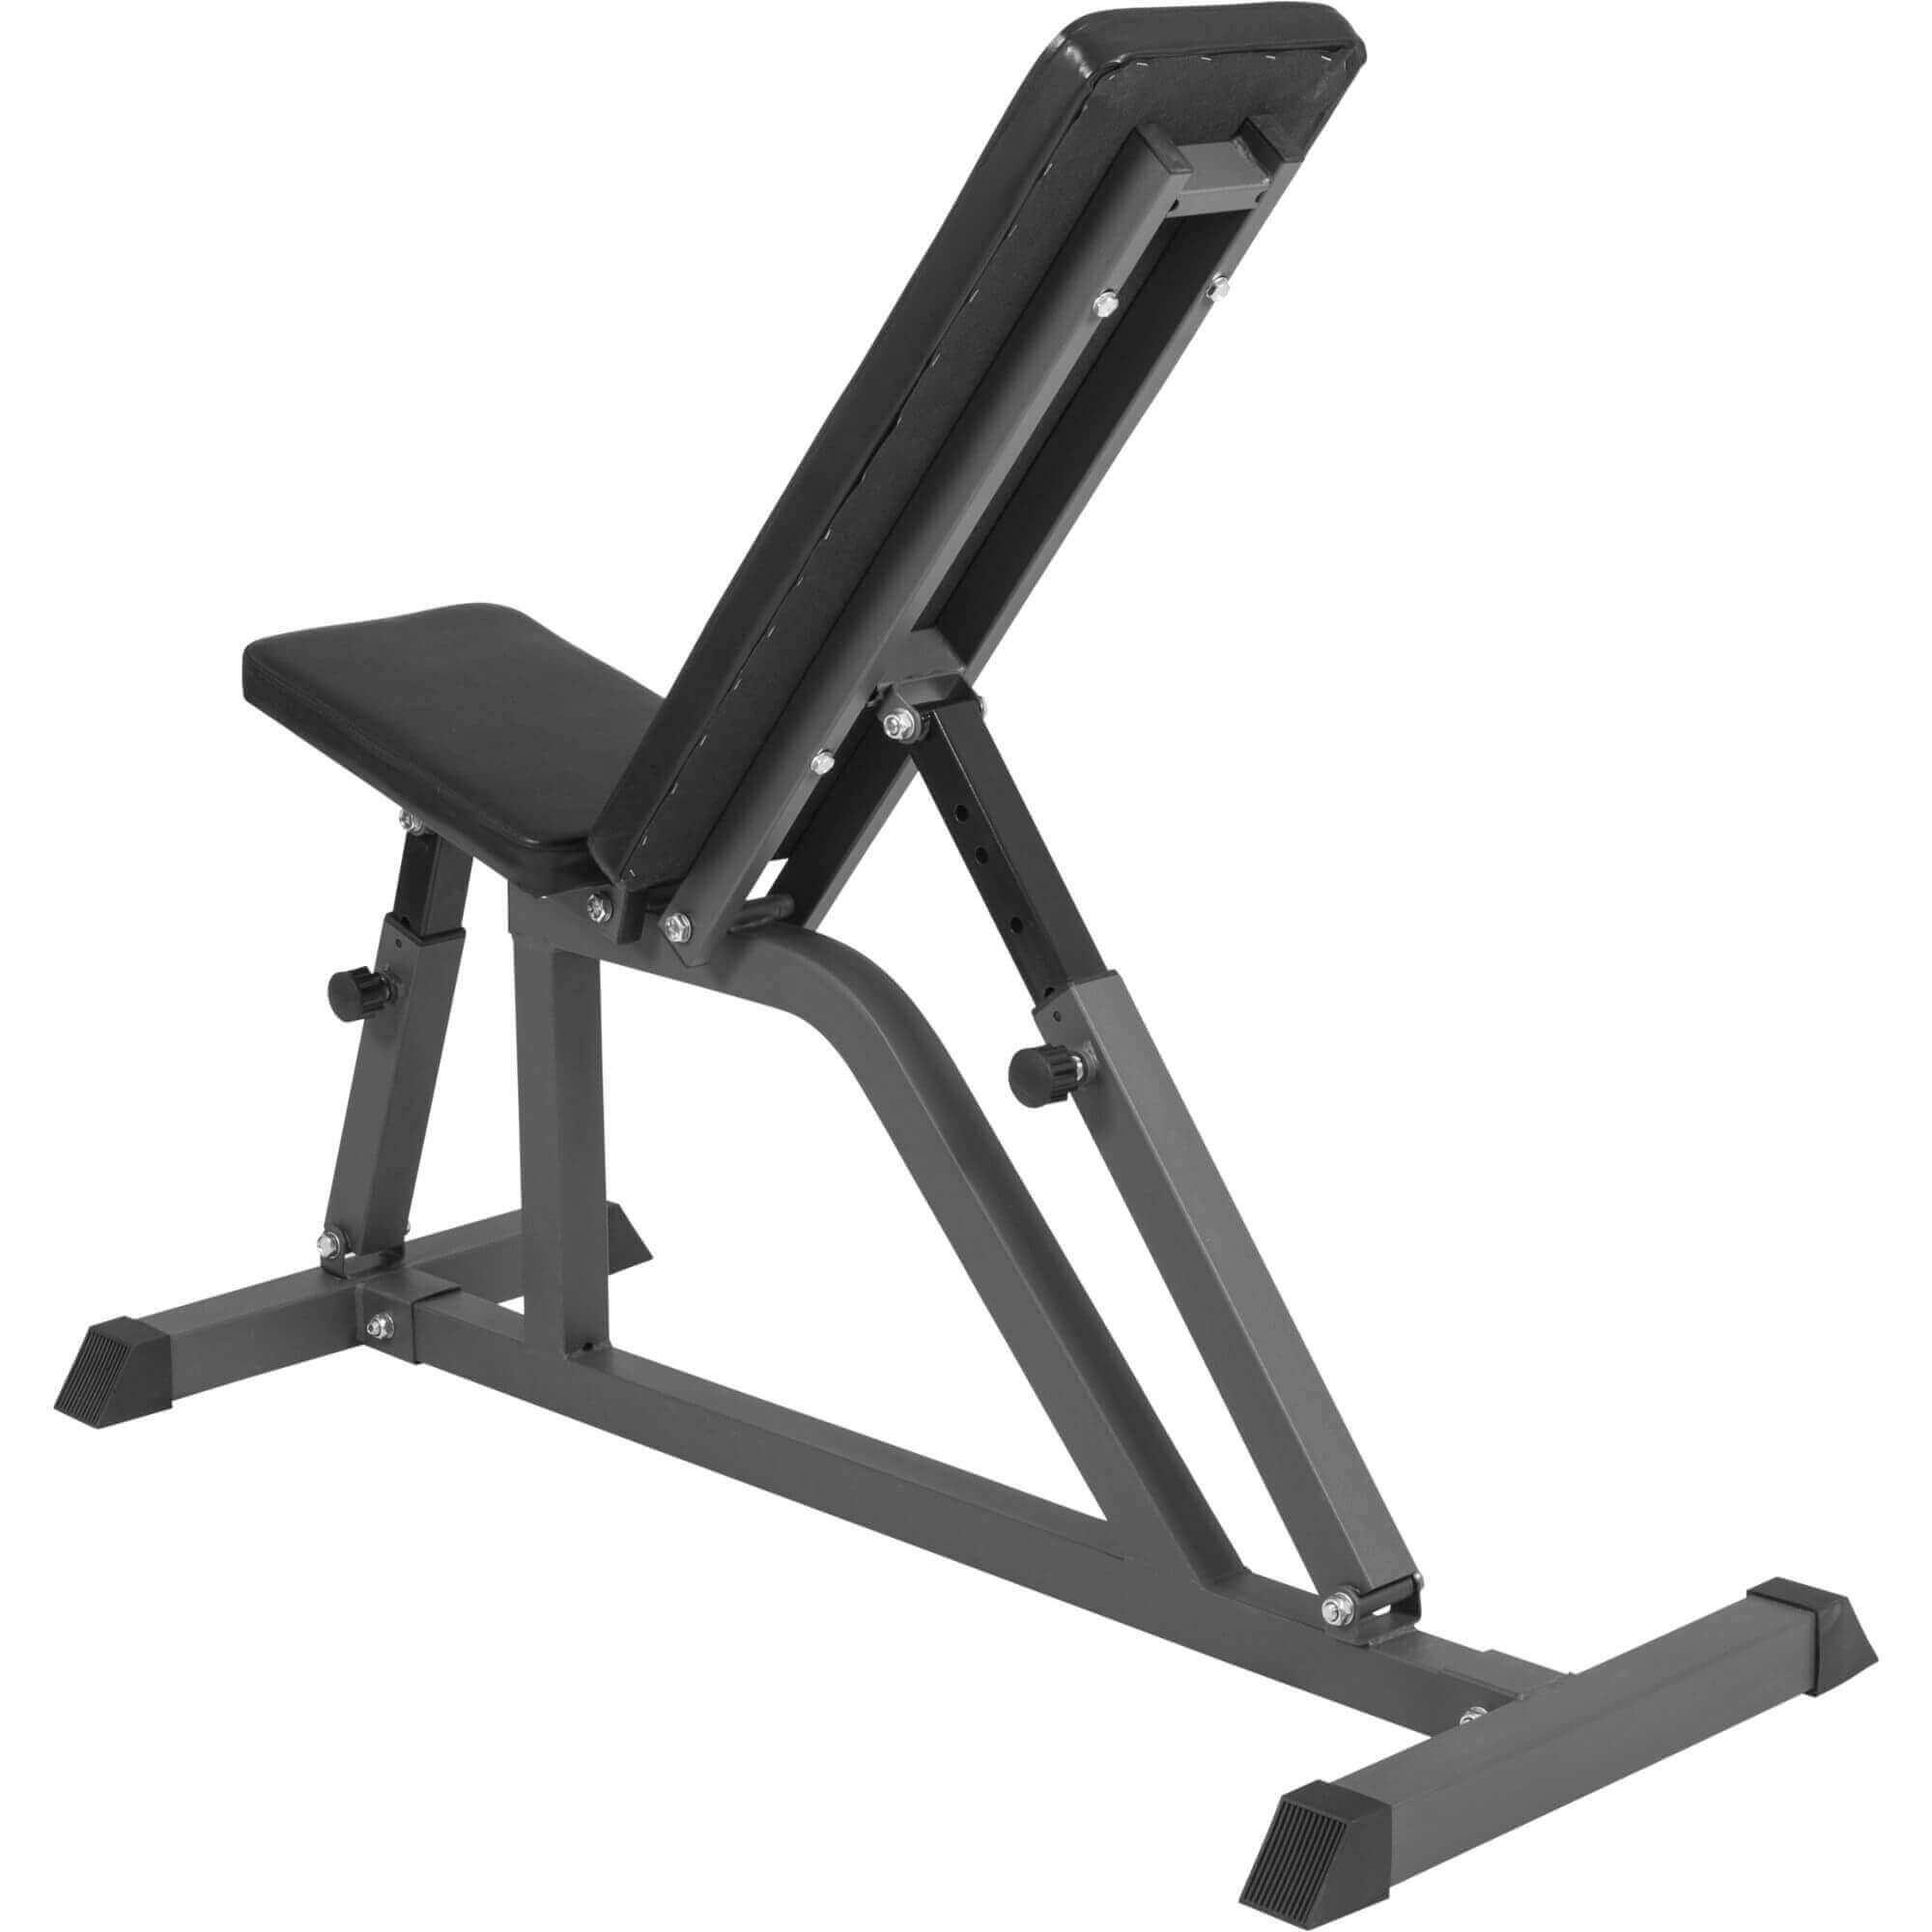 gyronetics hantelbank verstellbar negativ schr gbank trainingsbank fitnessbank ebay. Black Bedroom Furniture Sets. Home Design Ideas